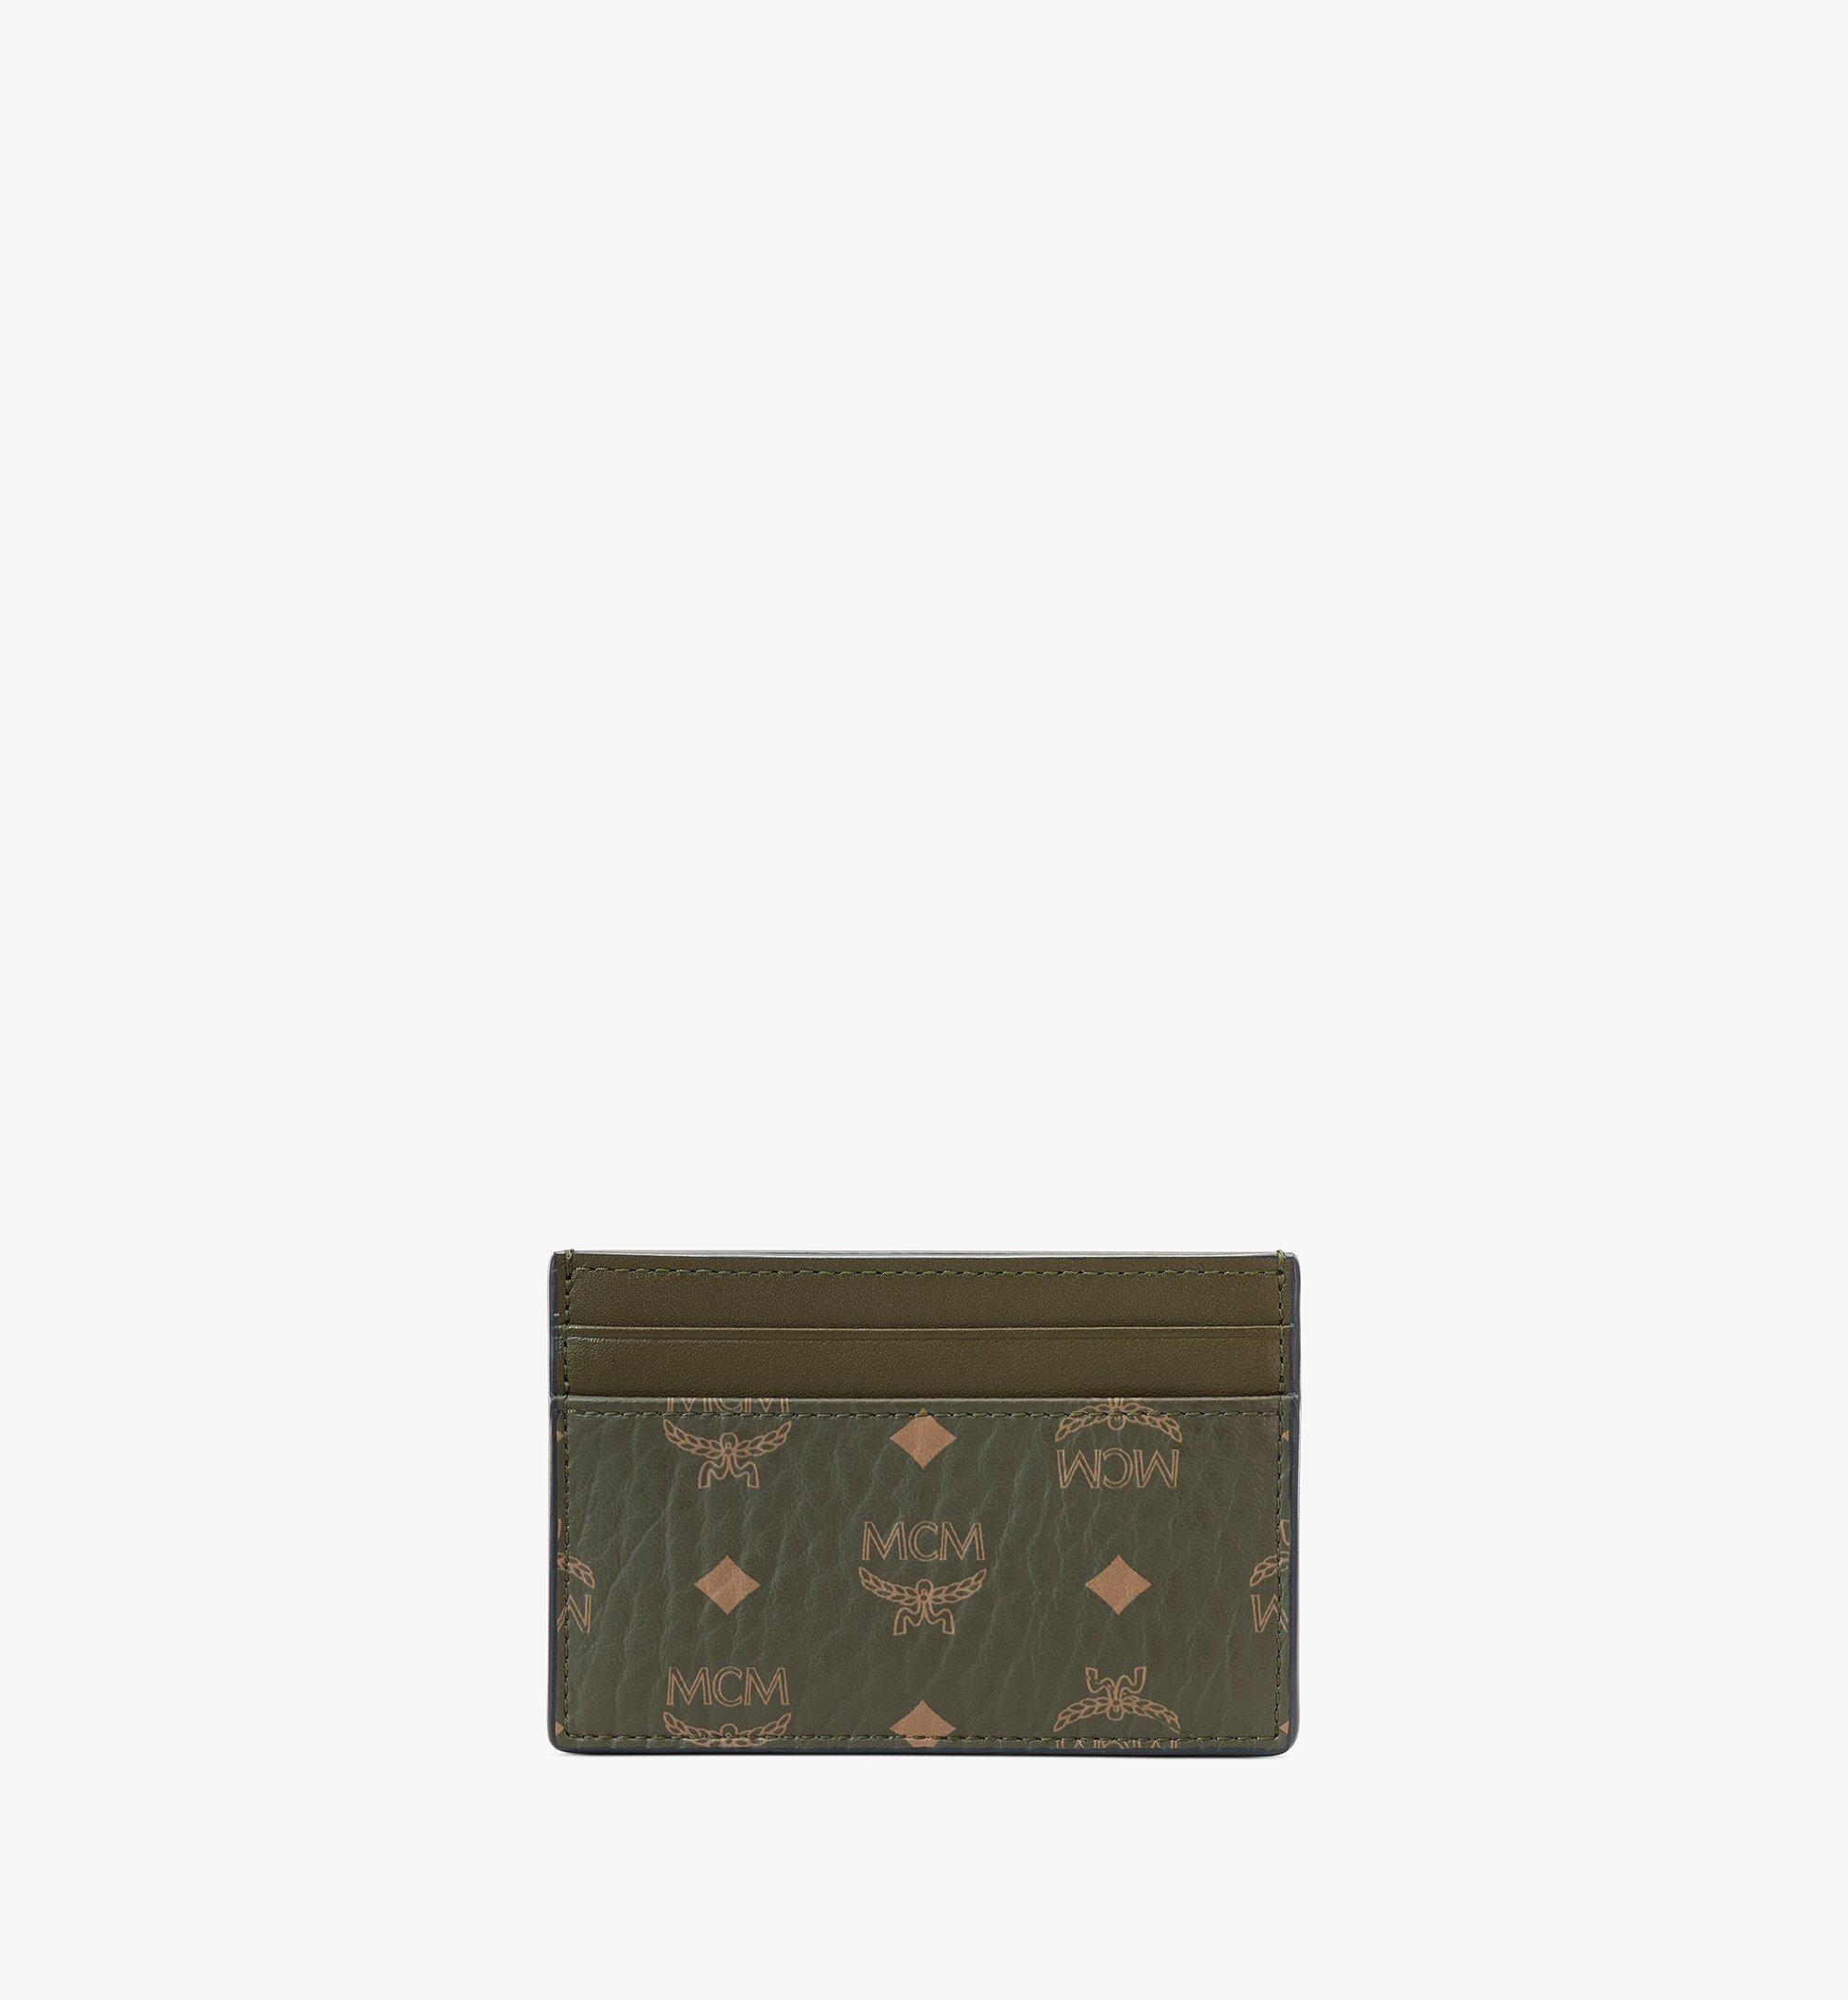 MCM Card Case in Visetos Original Green MXAAAVI01JH001 Alternate View 3